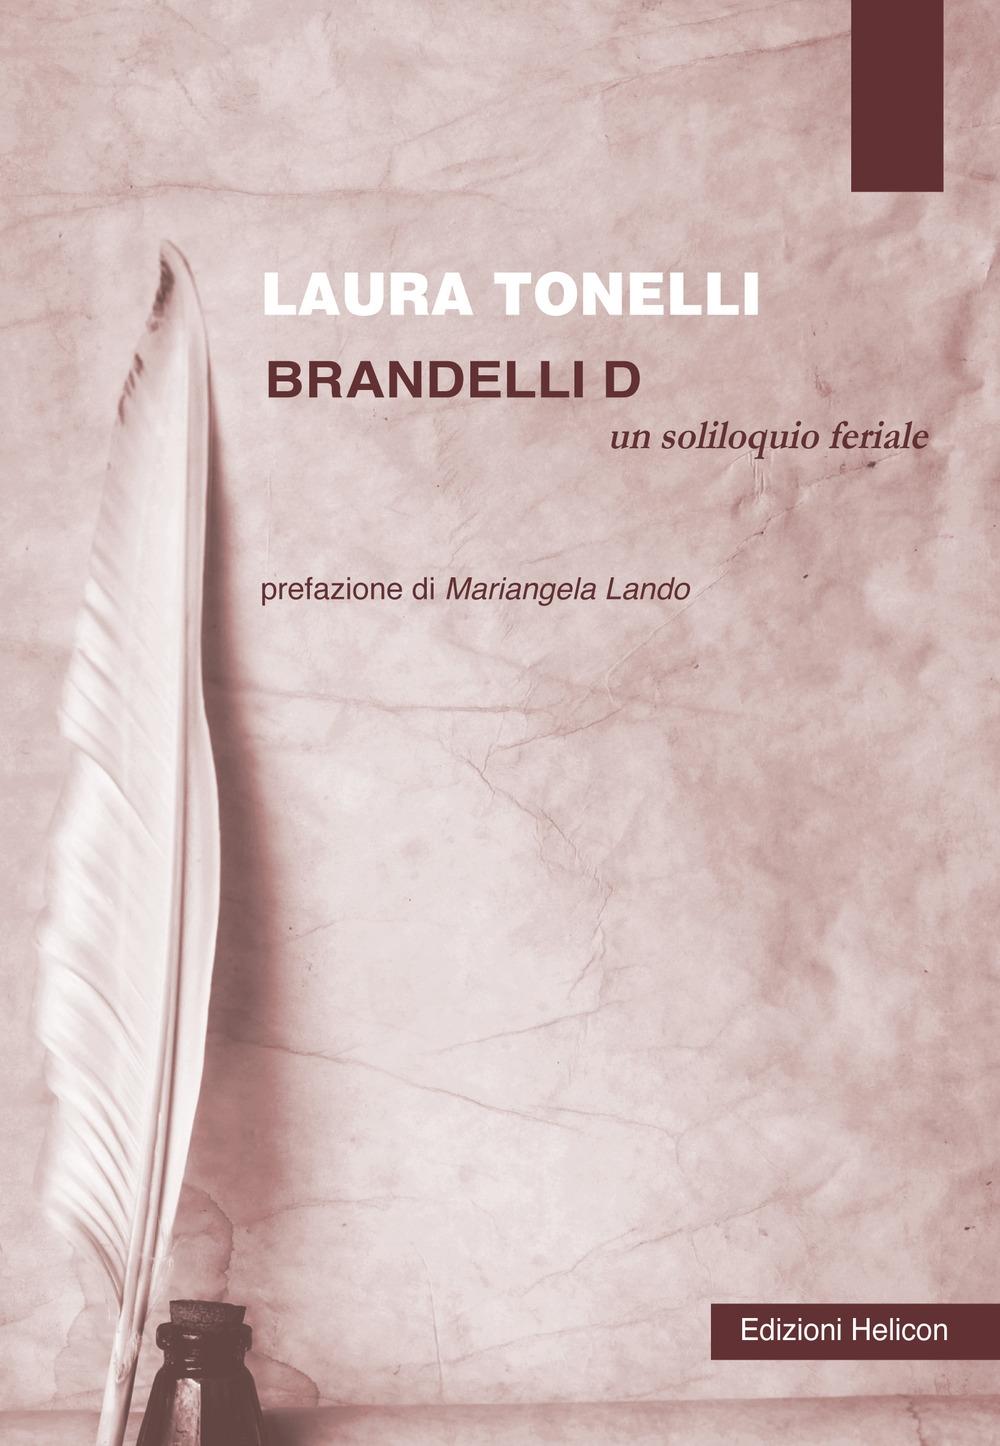 Brandelli D. Un soliloquio feriale